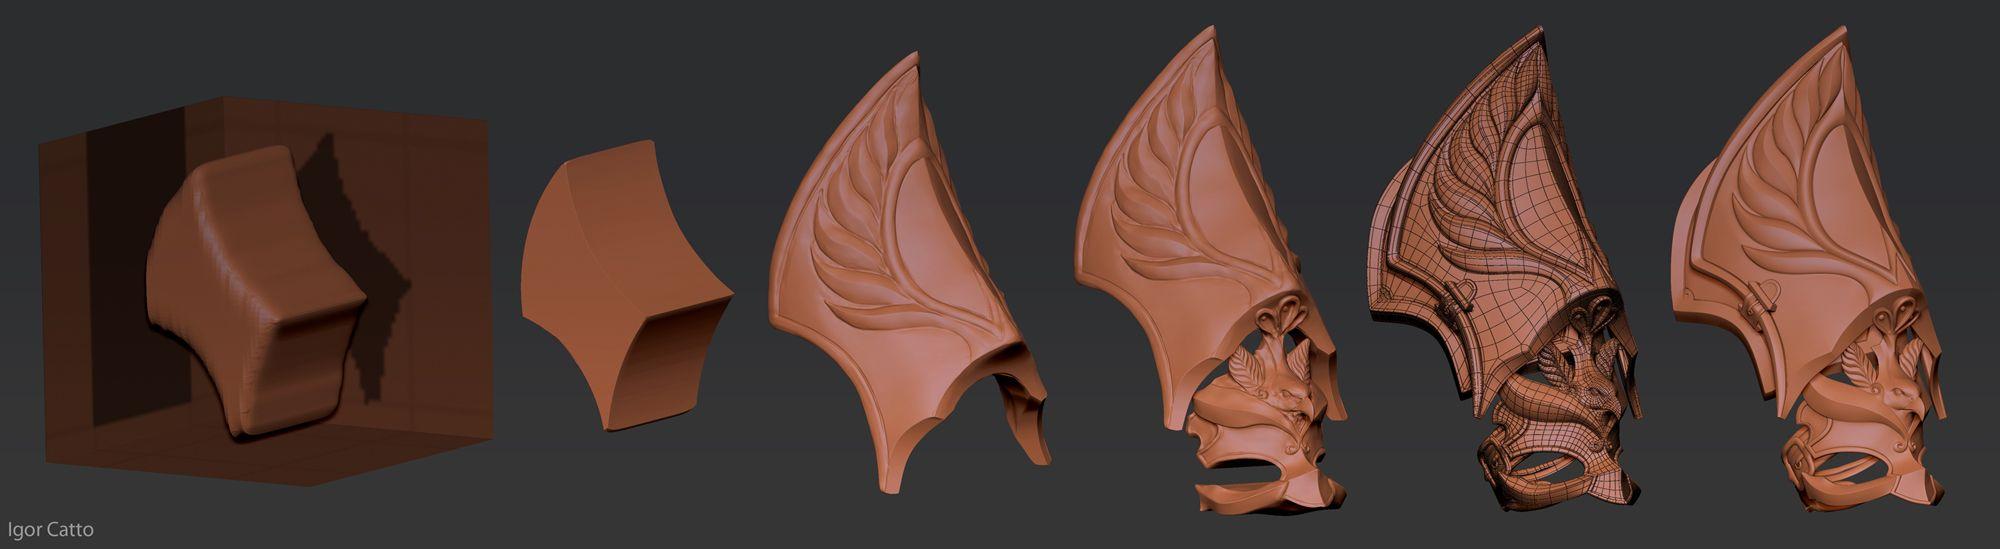 Step by Step - armor | tutors | Zbrush, Sculpting tutorials